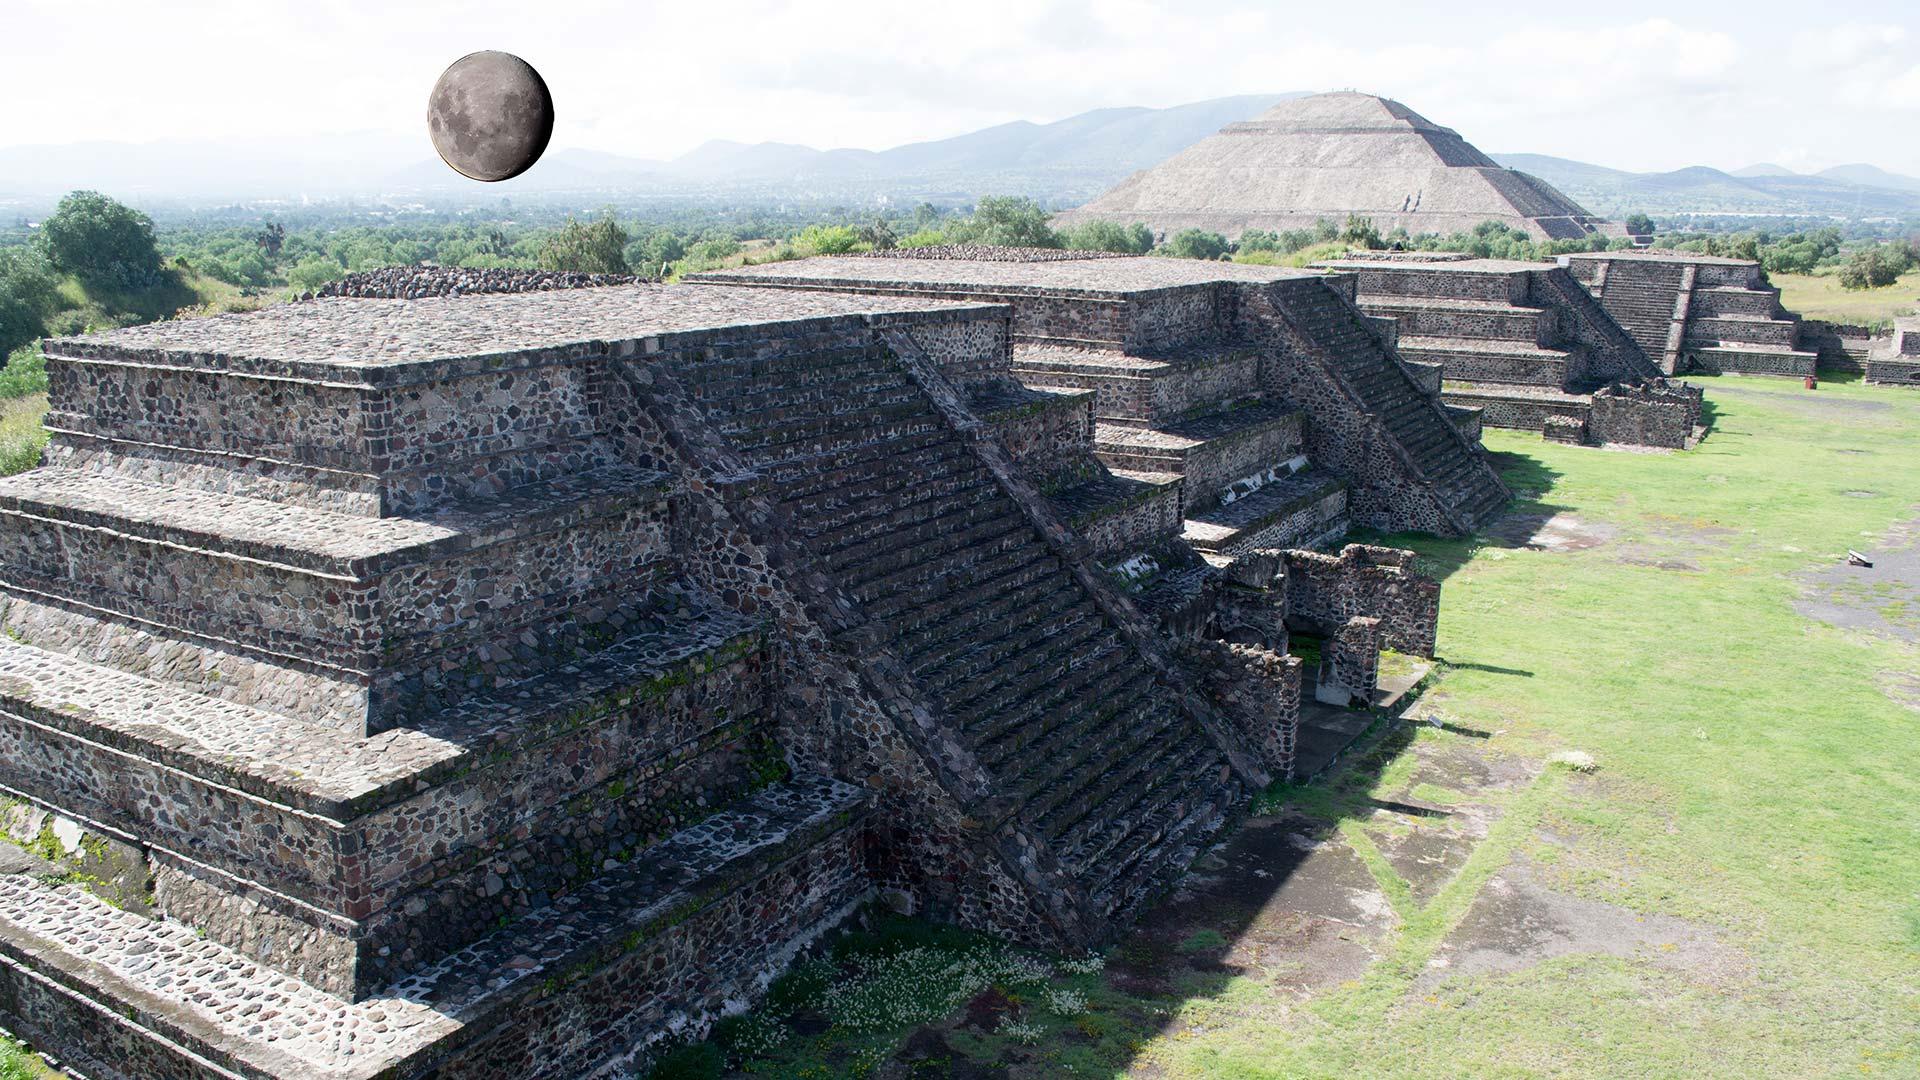 Pirâmides de la Luna - Teotihuacan - Mexico